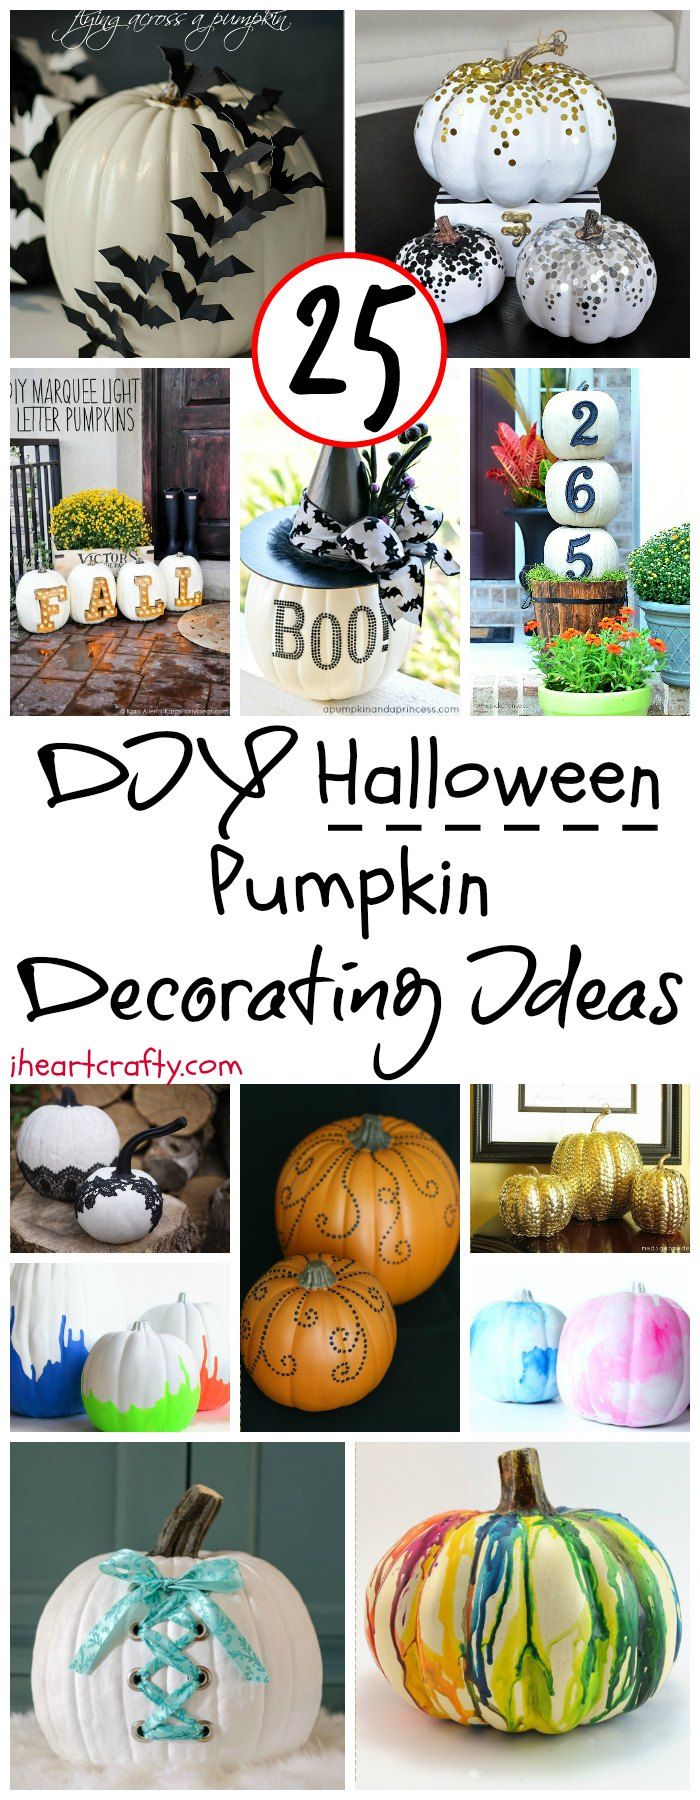 20 Easy DIY Halloween Pumpkin Decorating Ideas